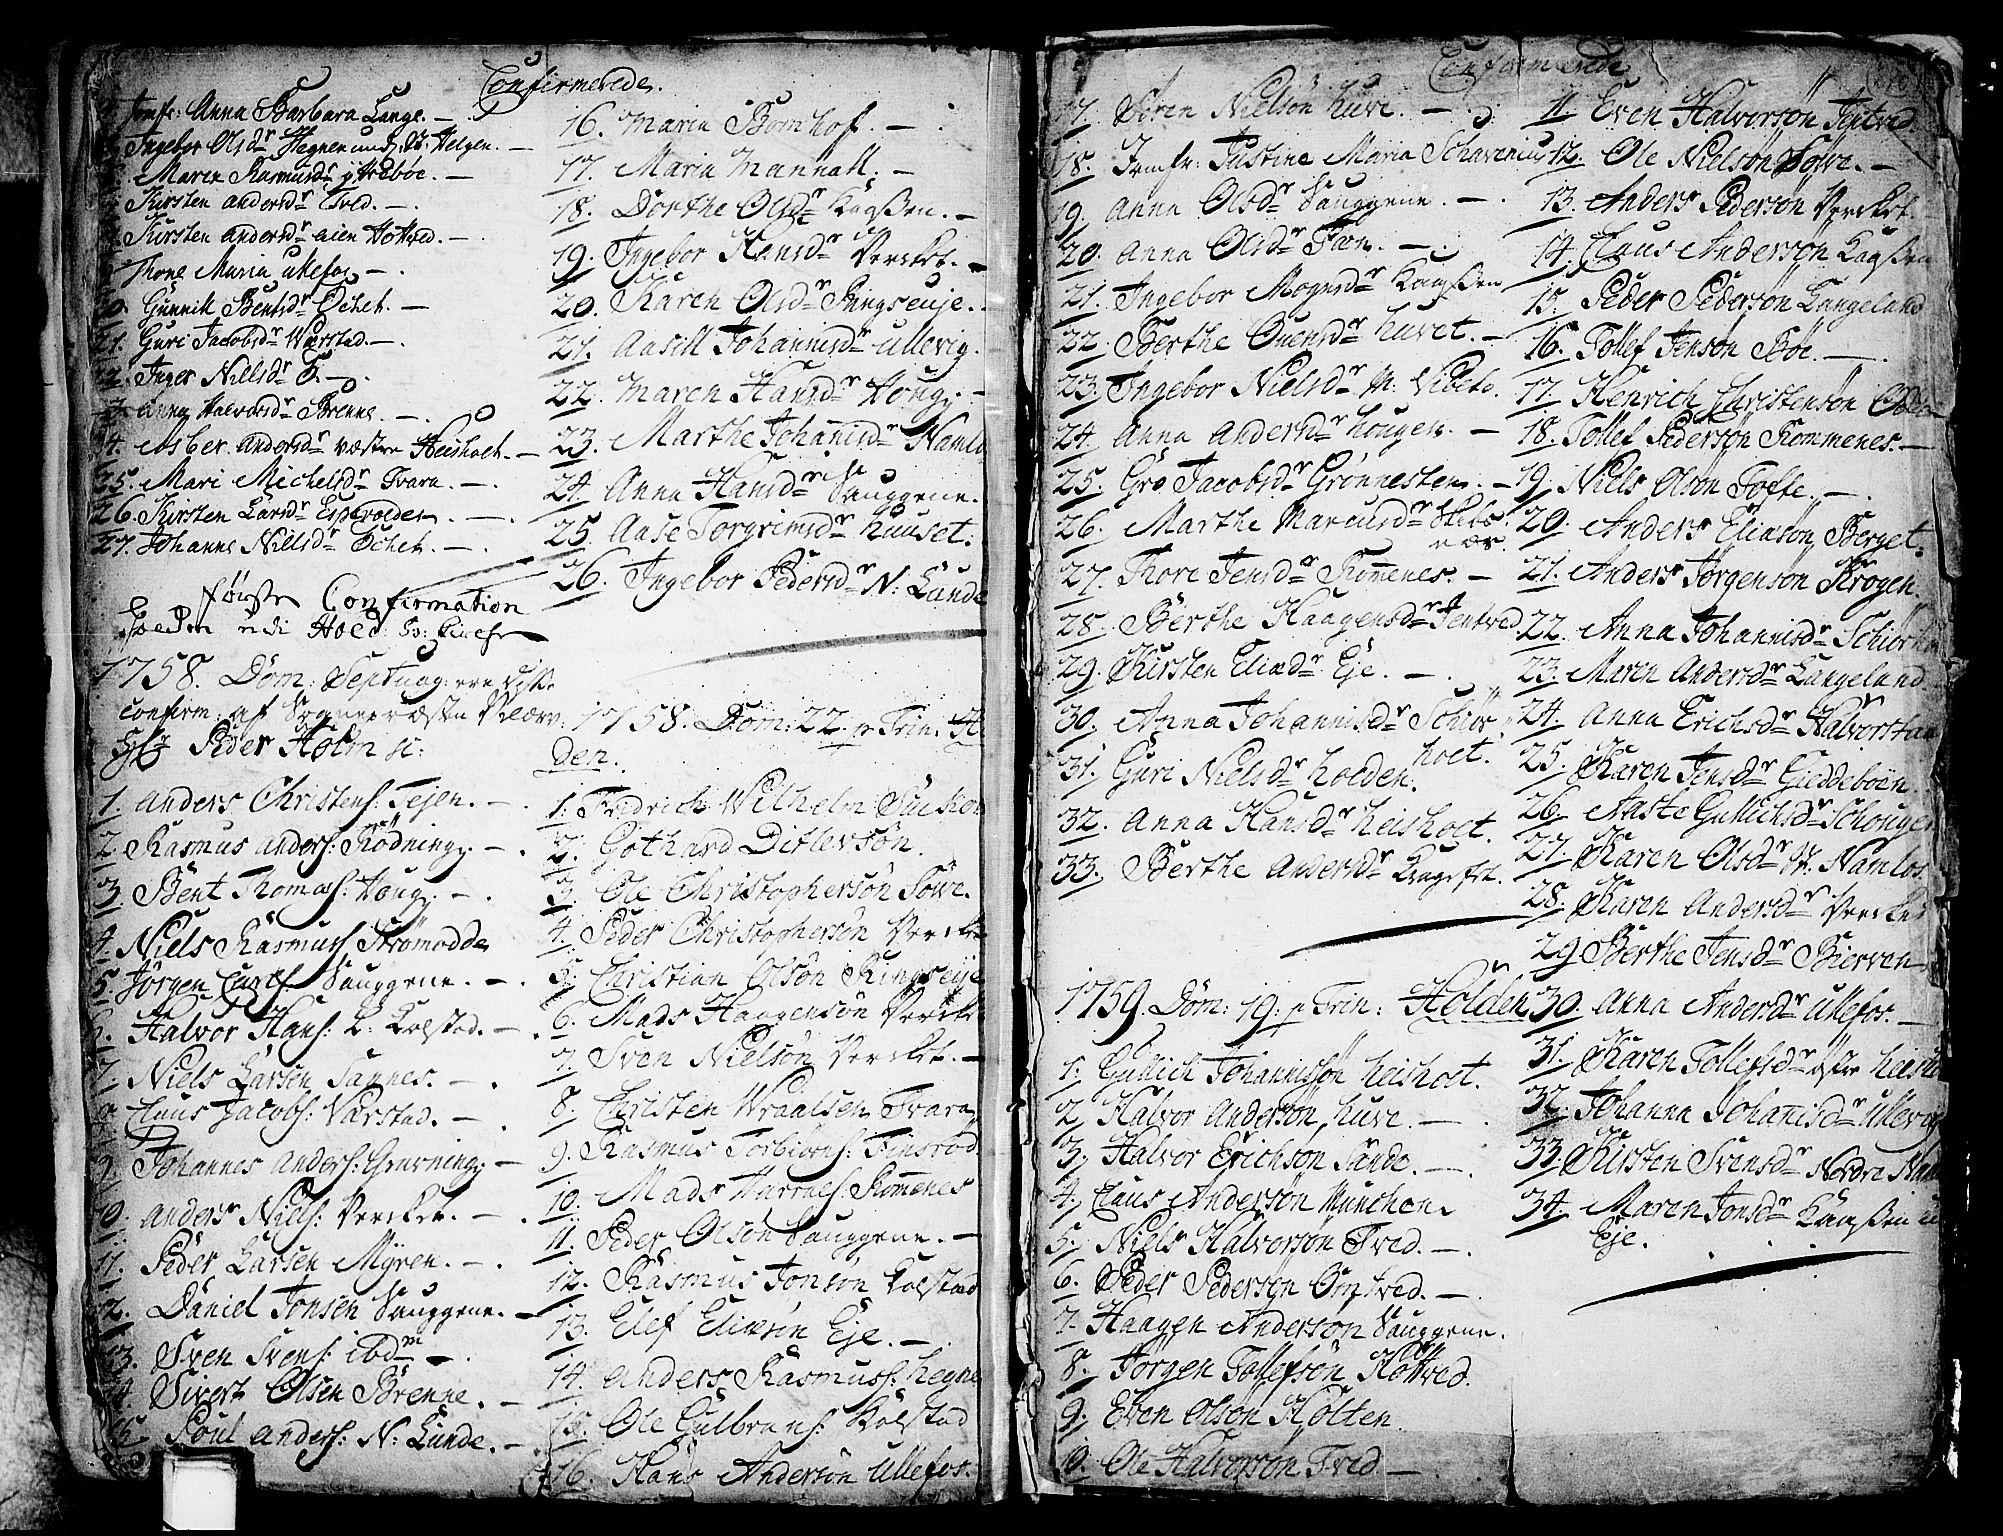 SAKO, Holla kirkebøker, F/Fa/L0001: Ministerialbok nr. 1, 1717-1779, s. 270